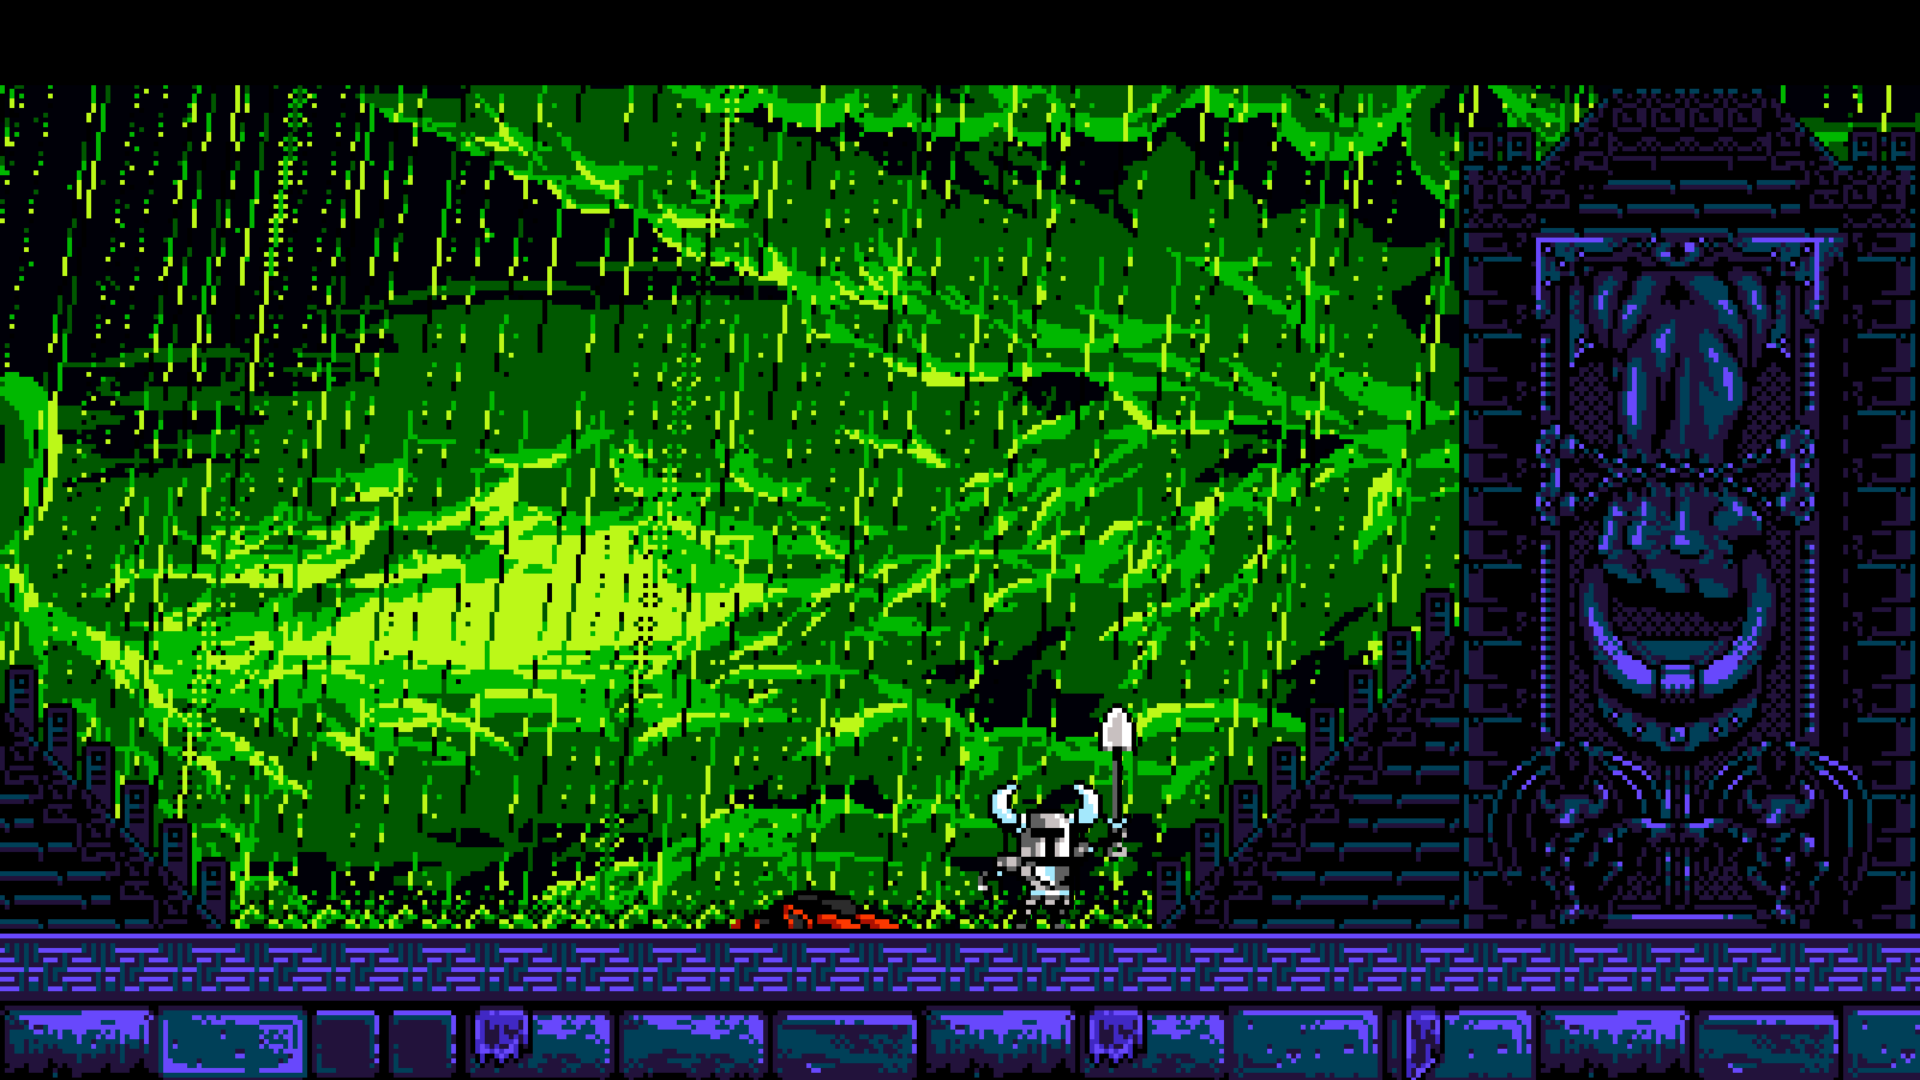 General 1920x1080 Shovel Knight video games pixel art retro games 8-bit 16-bit